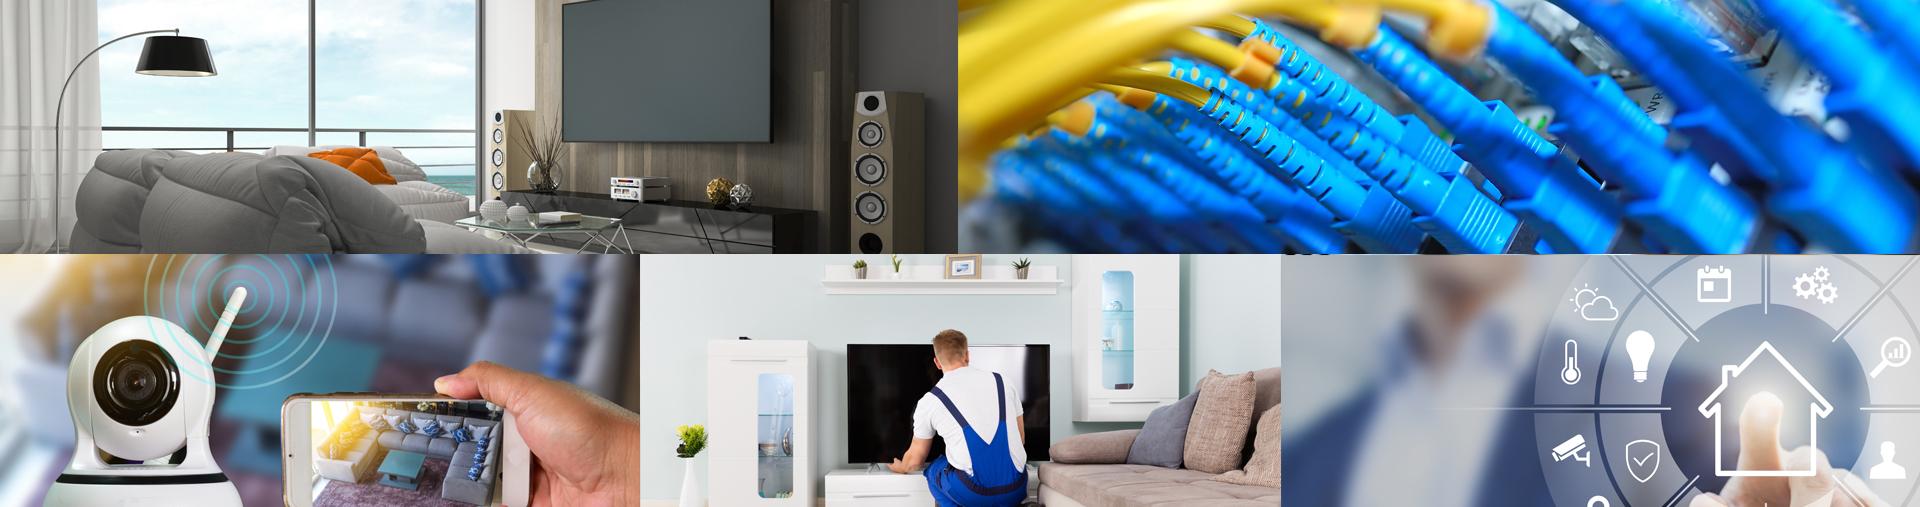 Suwannee-GA-home-Automation